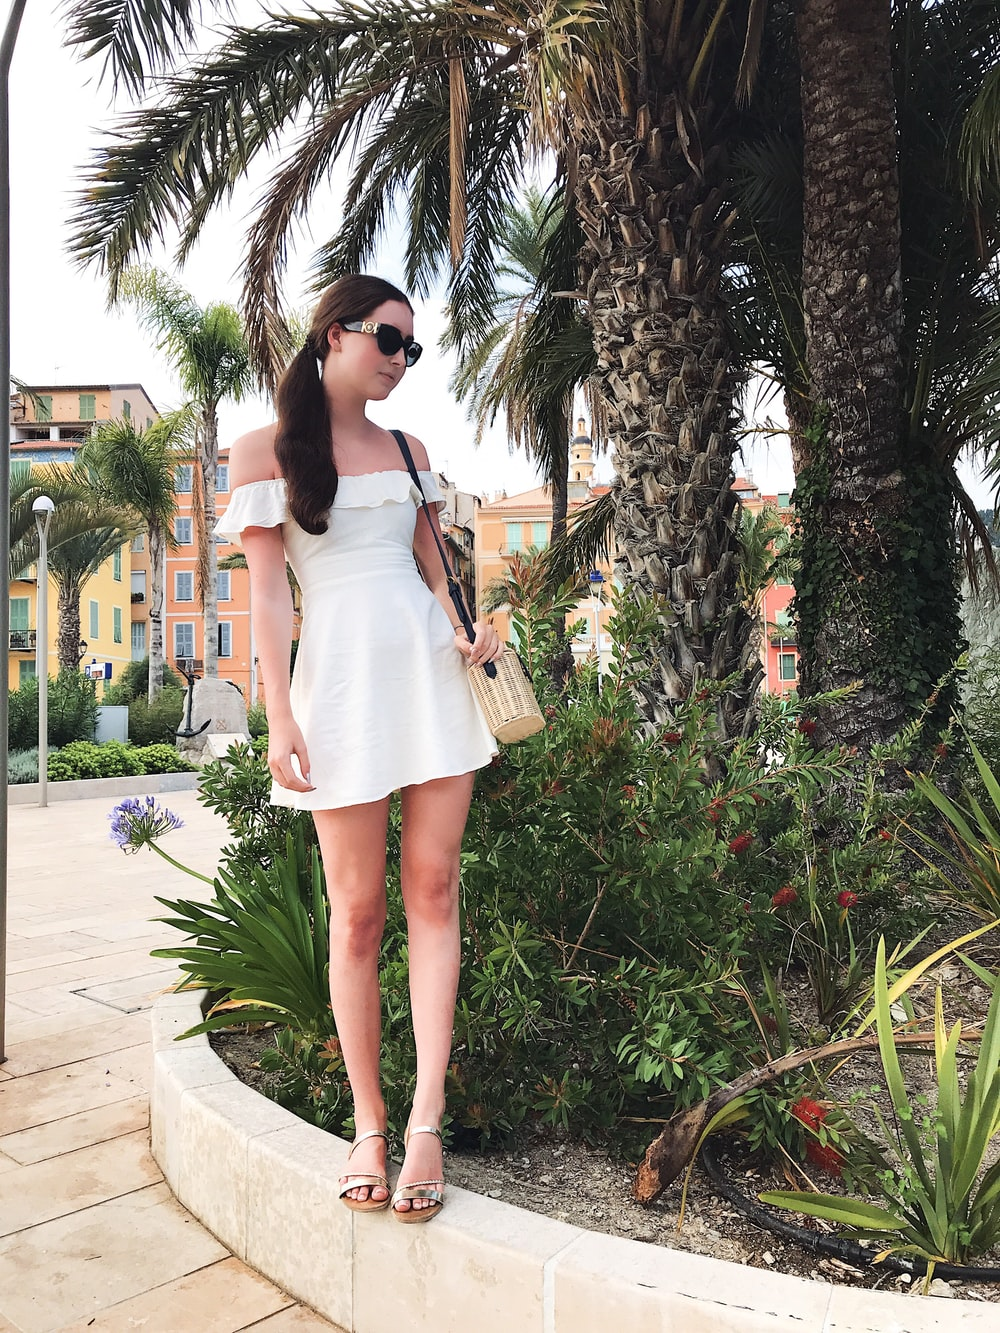 woman in white mini dress beside palm trees